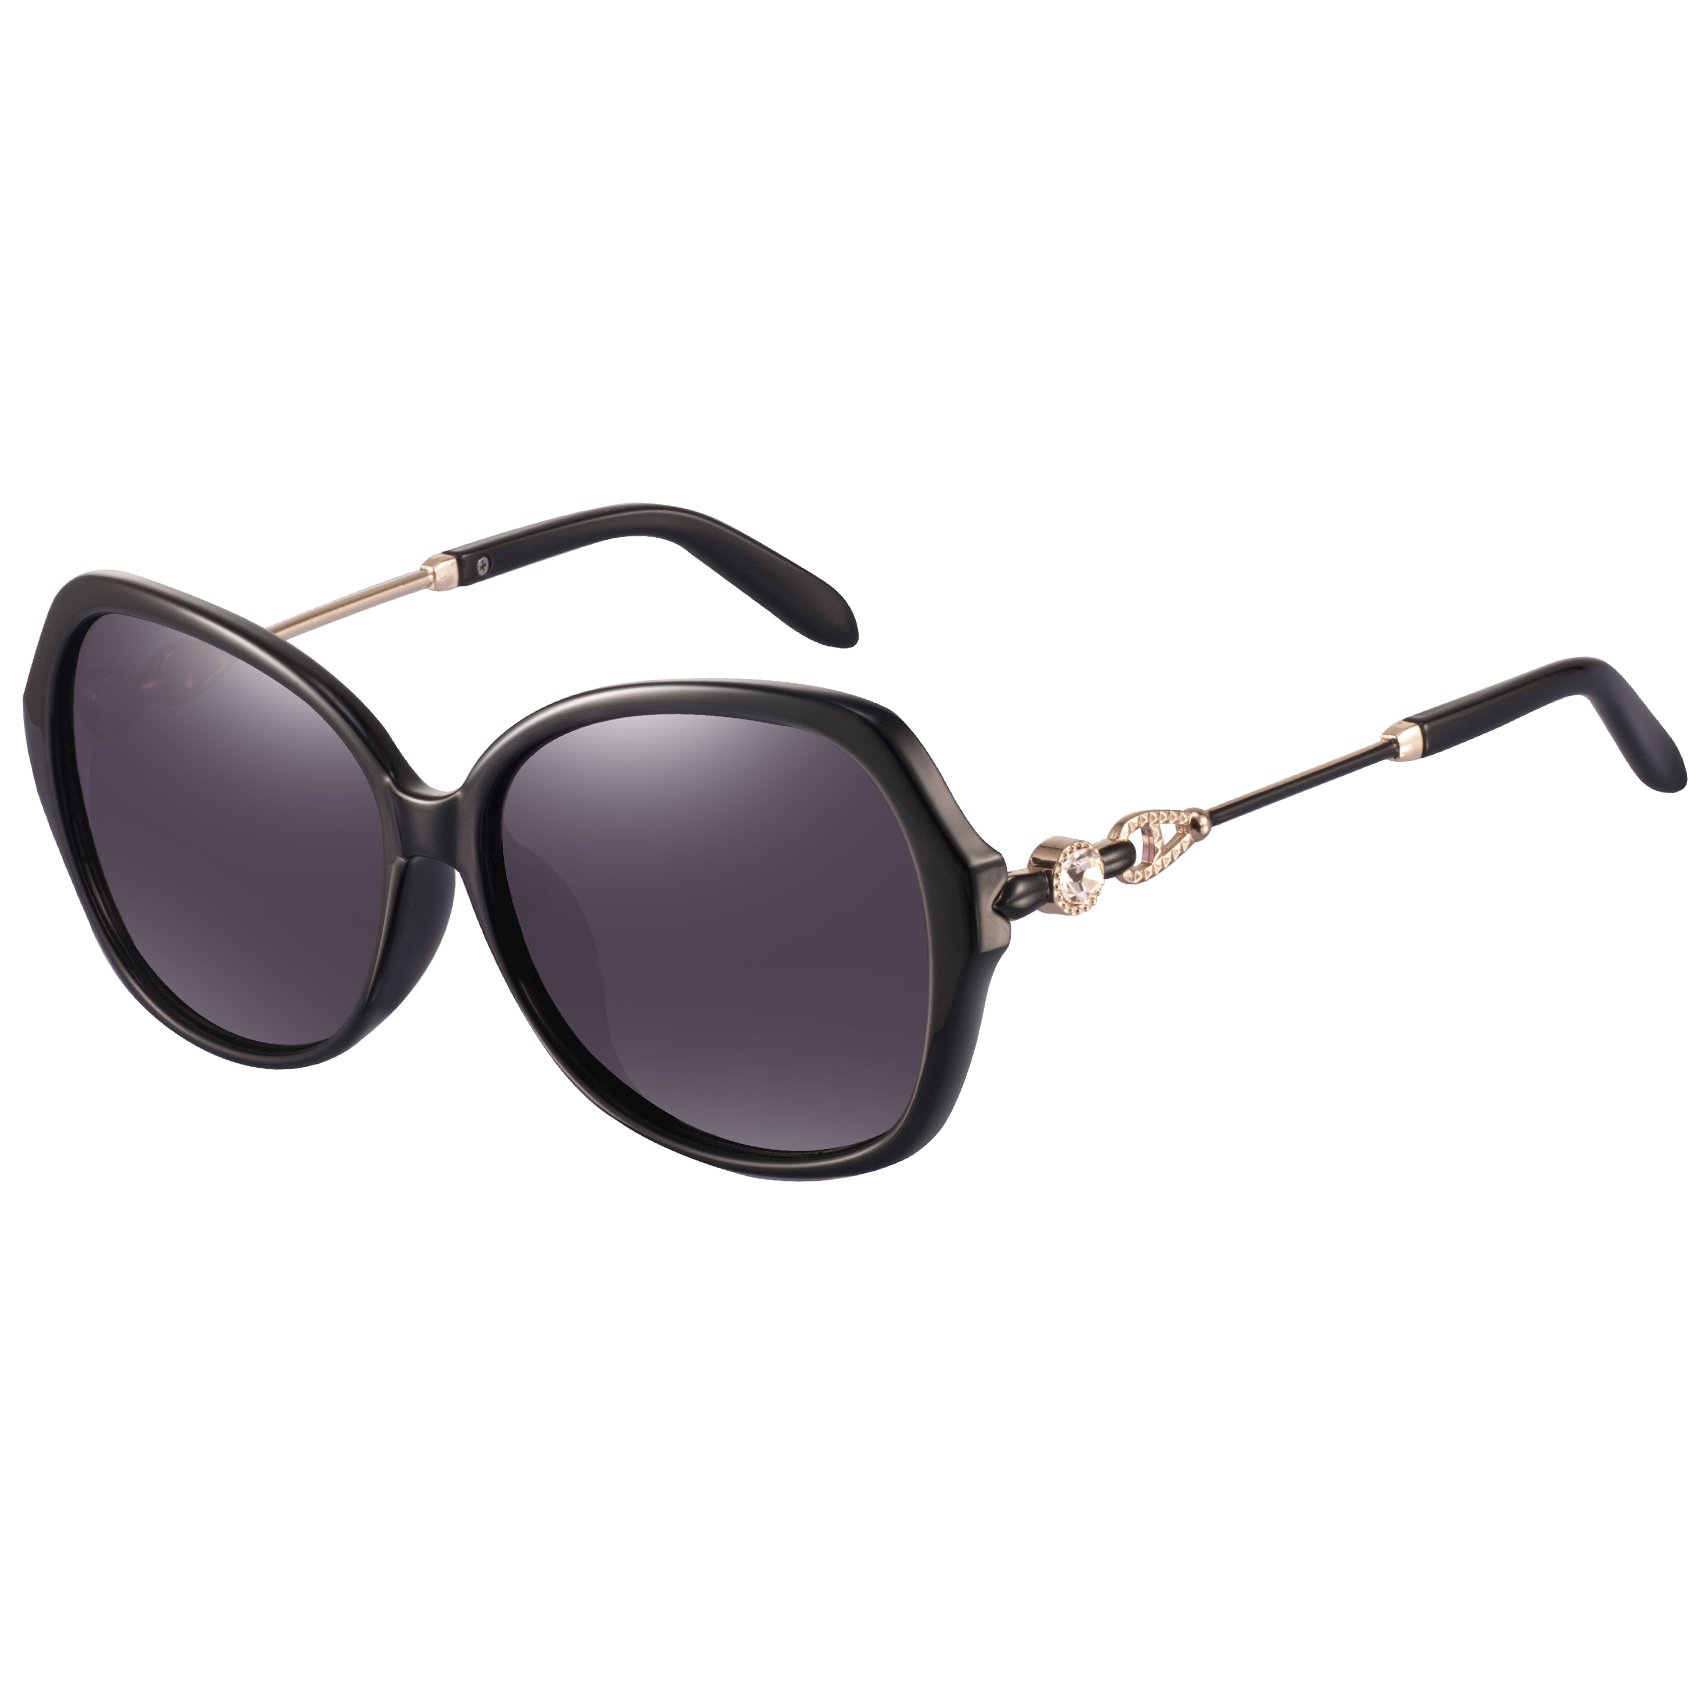 Women`s Polarized Sunglasses for Women - FEIDU Polarized Sunglasses for Women Sunglasses FD2151 (black-round dm, 63) by FEIDU